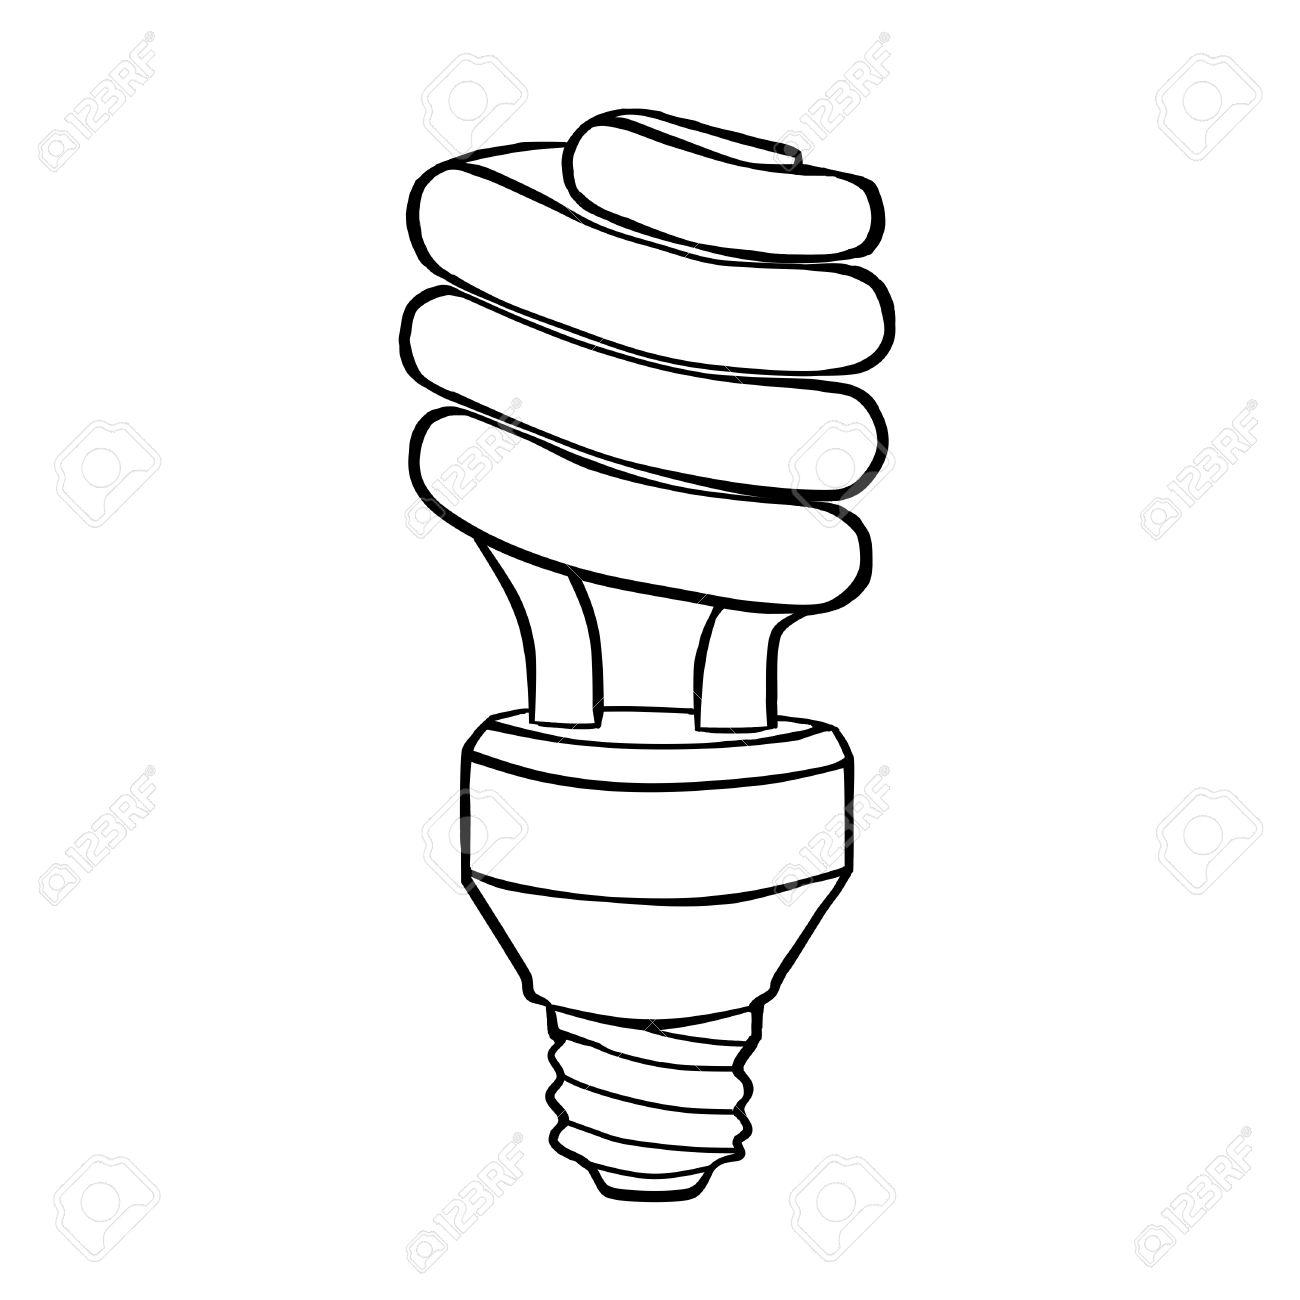 1300x1300 Spiral Energy Saving Electric Discharge Lamp. Contour Drawing